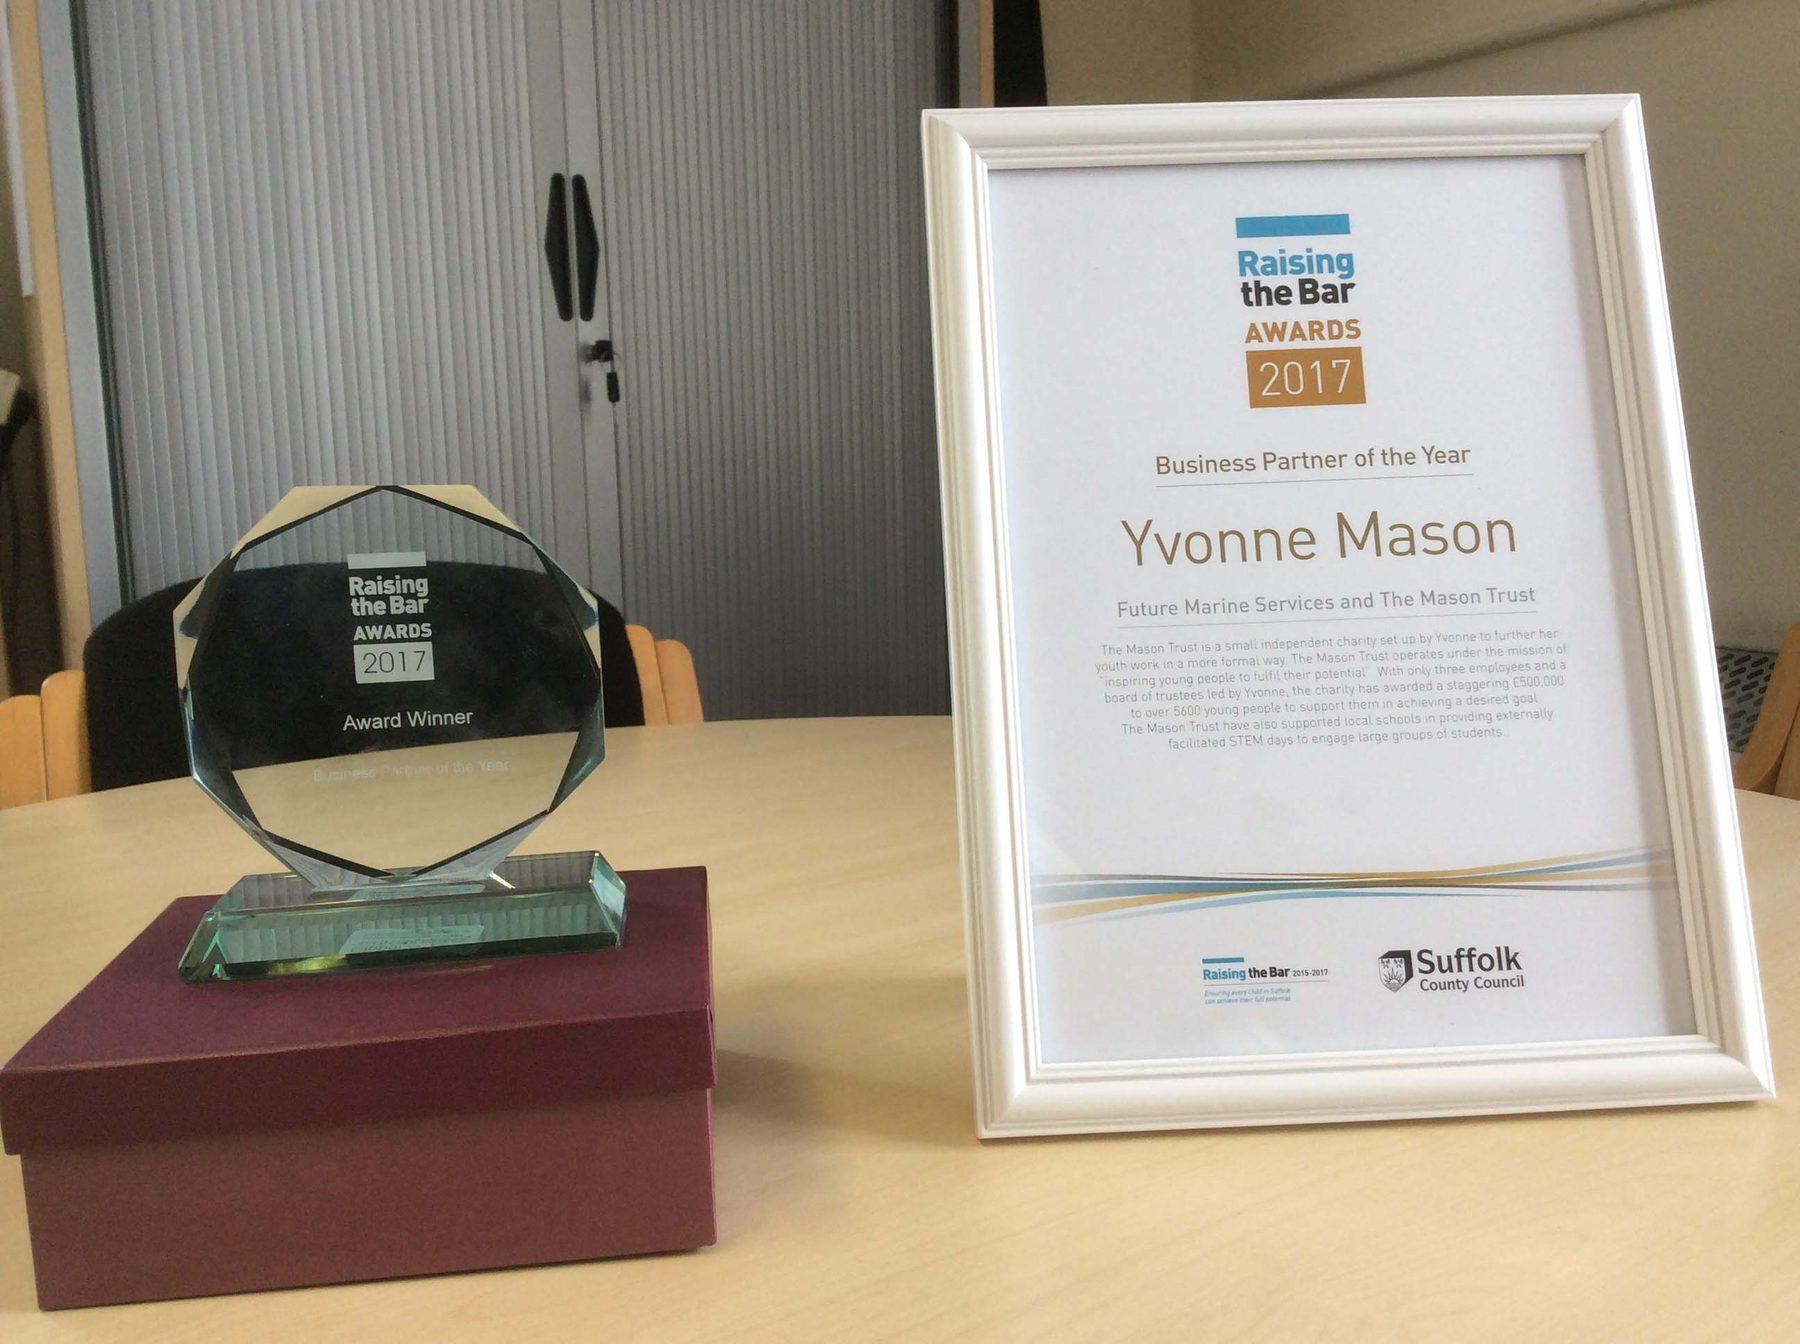 Organisation Image (The Mason Trust: Raising the Bar 2017 Awards)